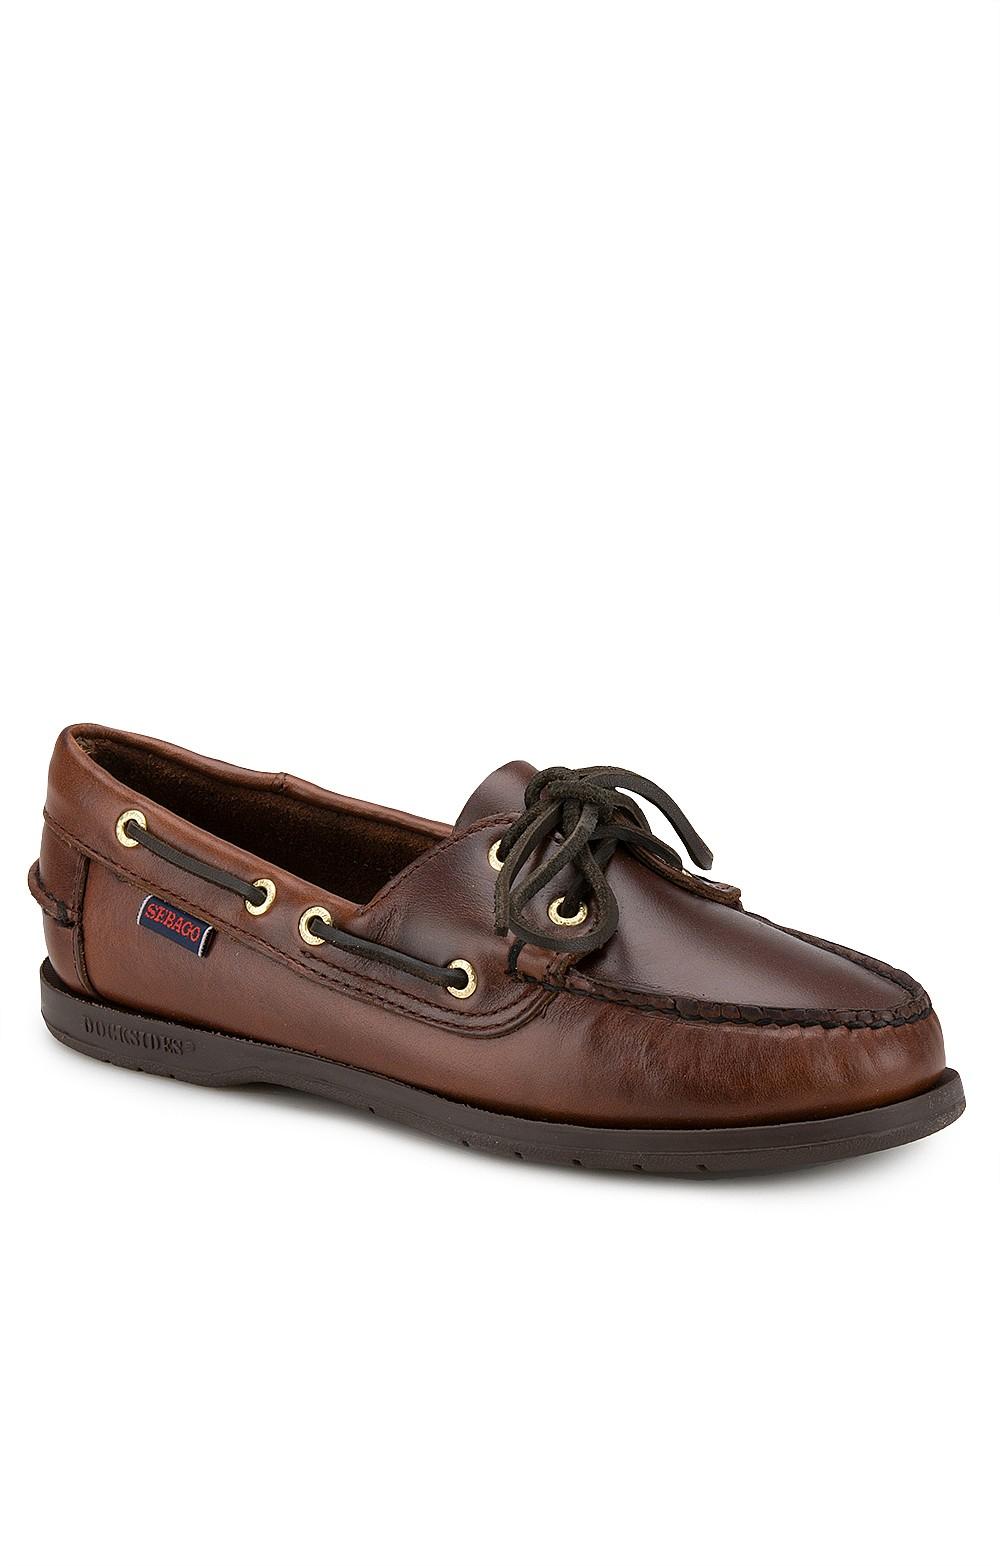 74357210ed8f9 Sebago Boat Shoe | Sebago | House Of Bruar